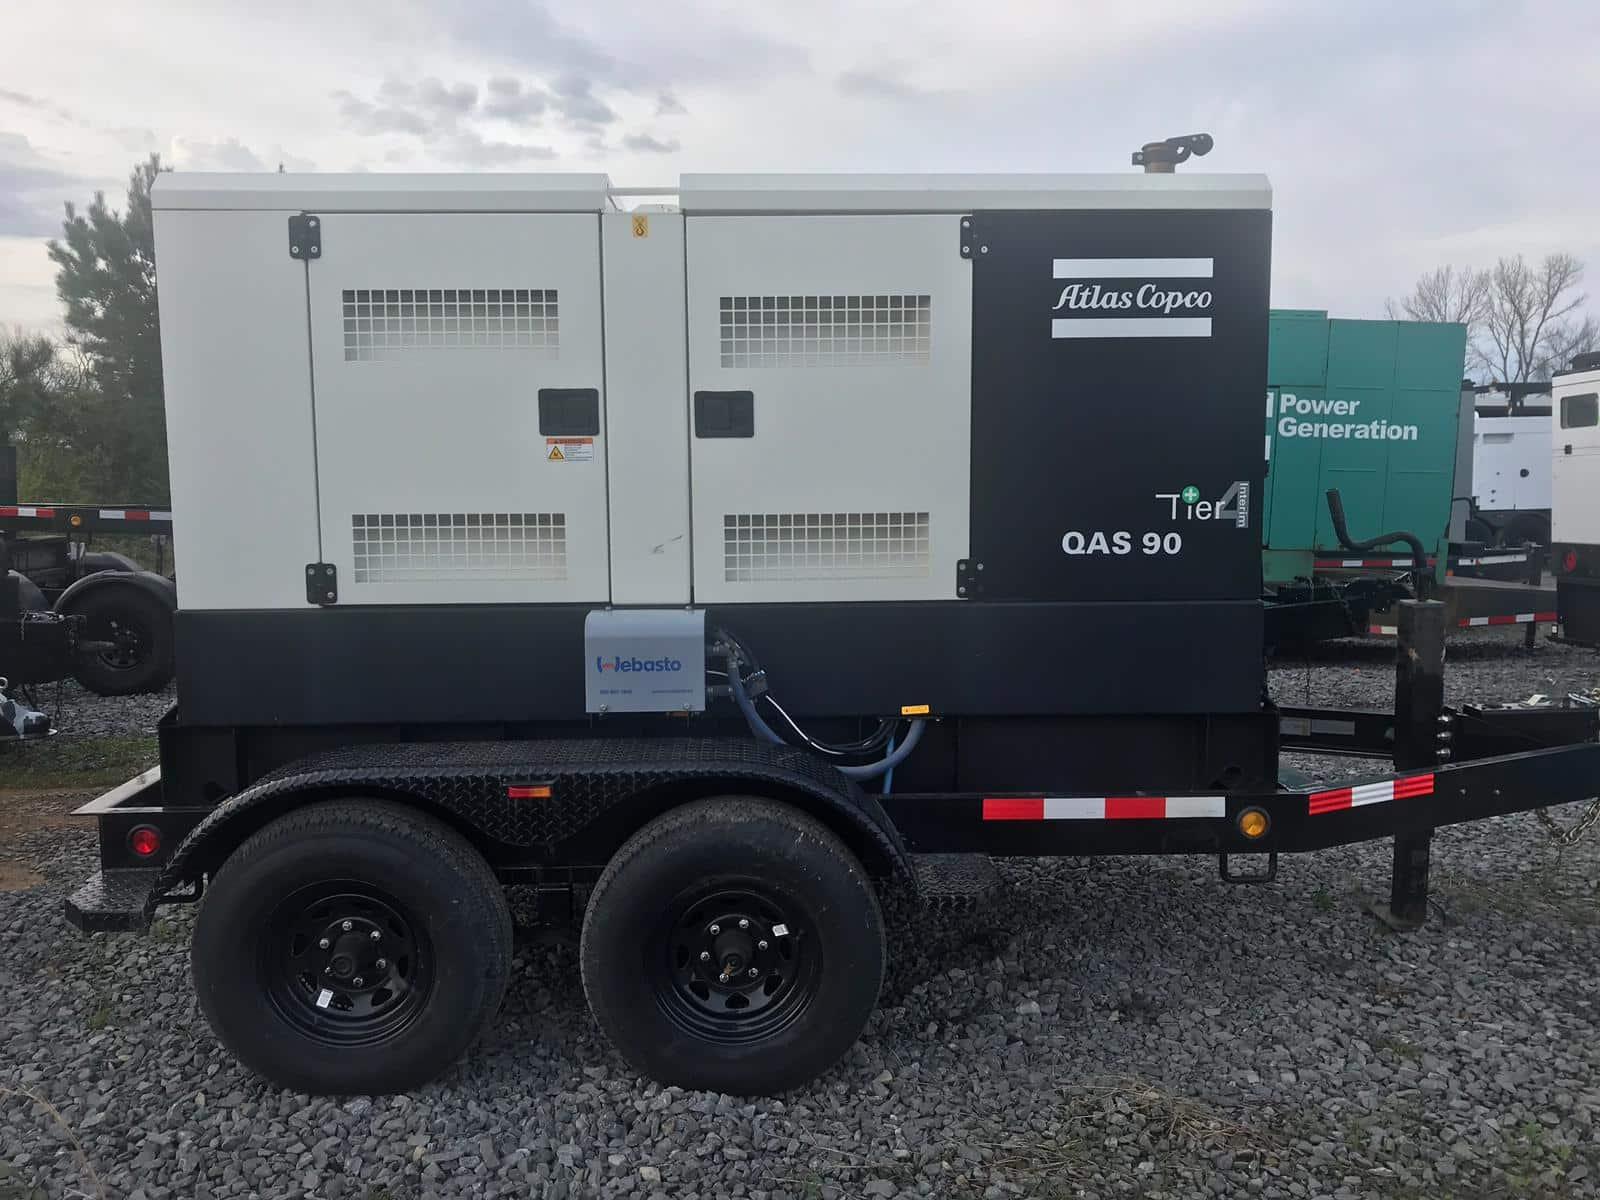 72 kW Atlas Copco Diesel Generator Rental – EPA Tier 4i Certified